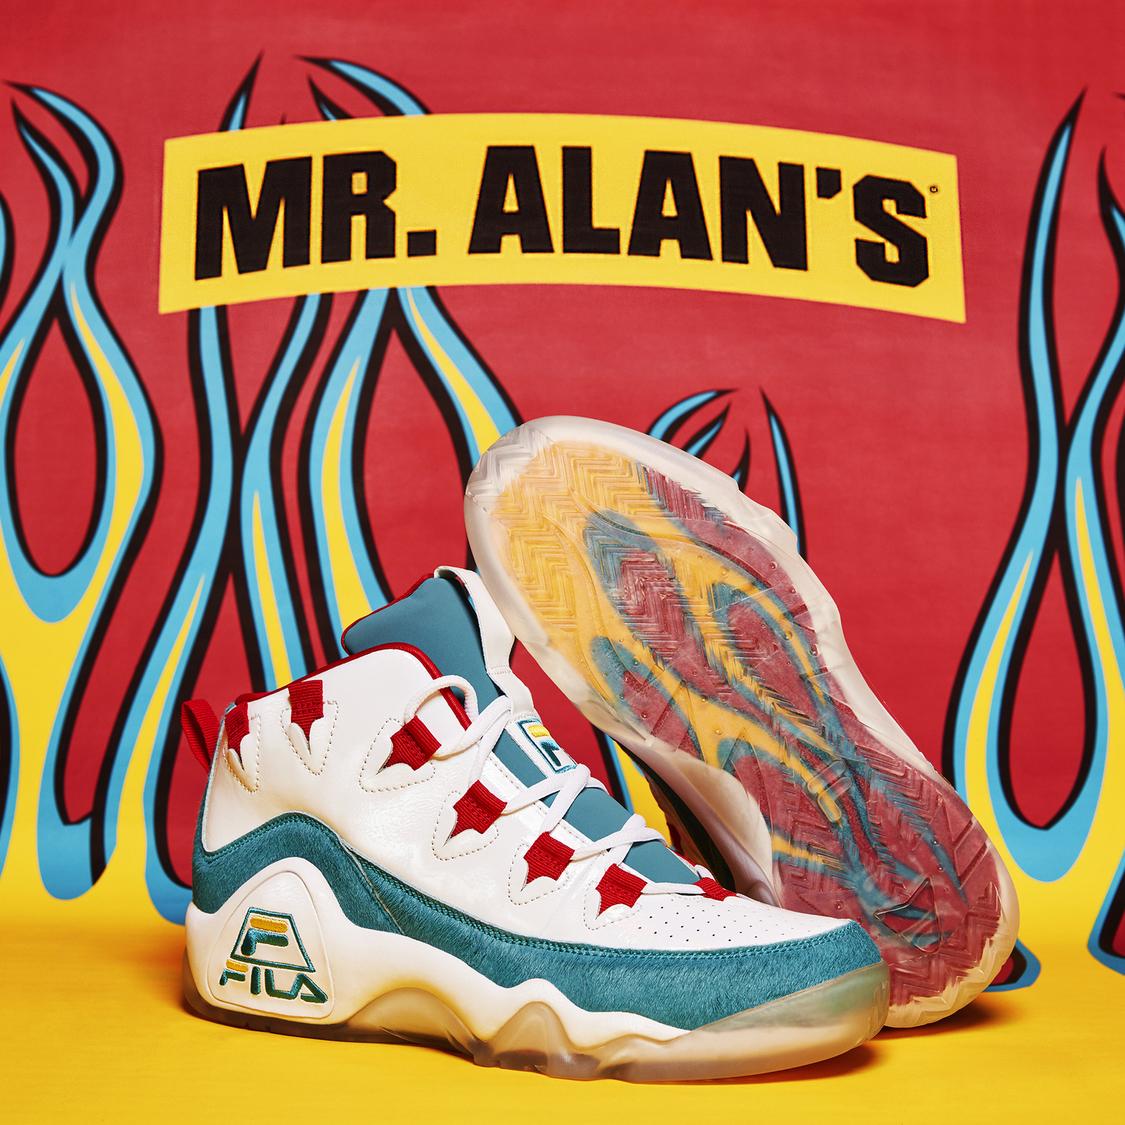 Fila-95-x-Mr-Alans-7